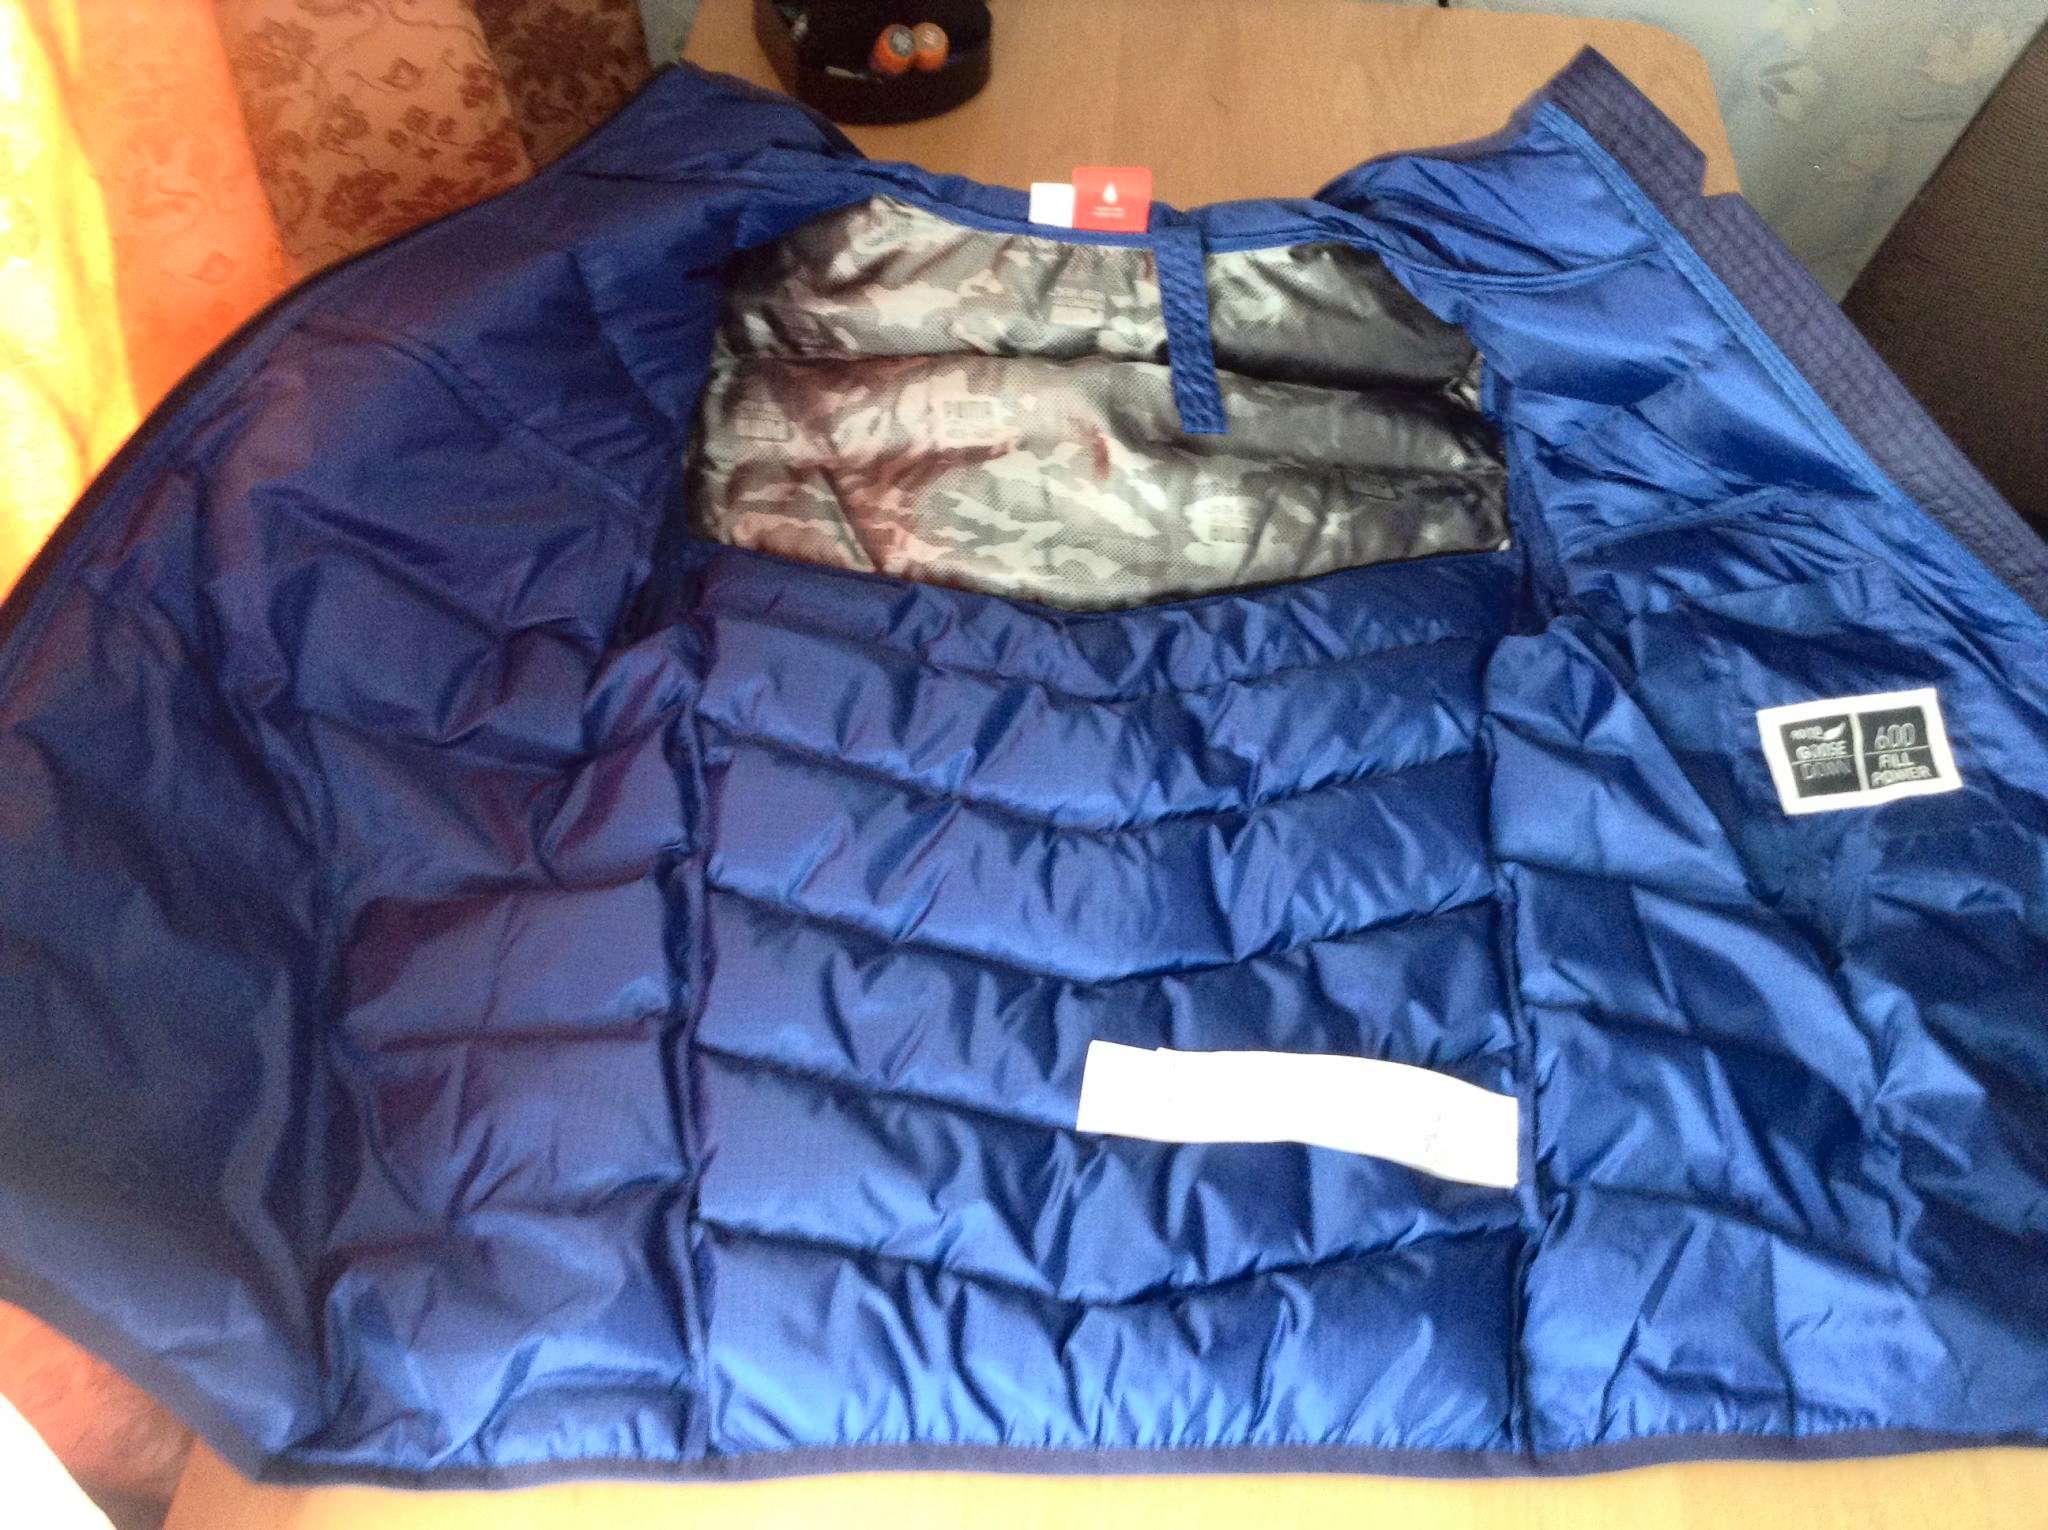 4601299f41cd ...  puhovik puma active goose down jacket mugskoy razmer 42 44 xs 1472293825 3.jpeg  ...